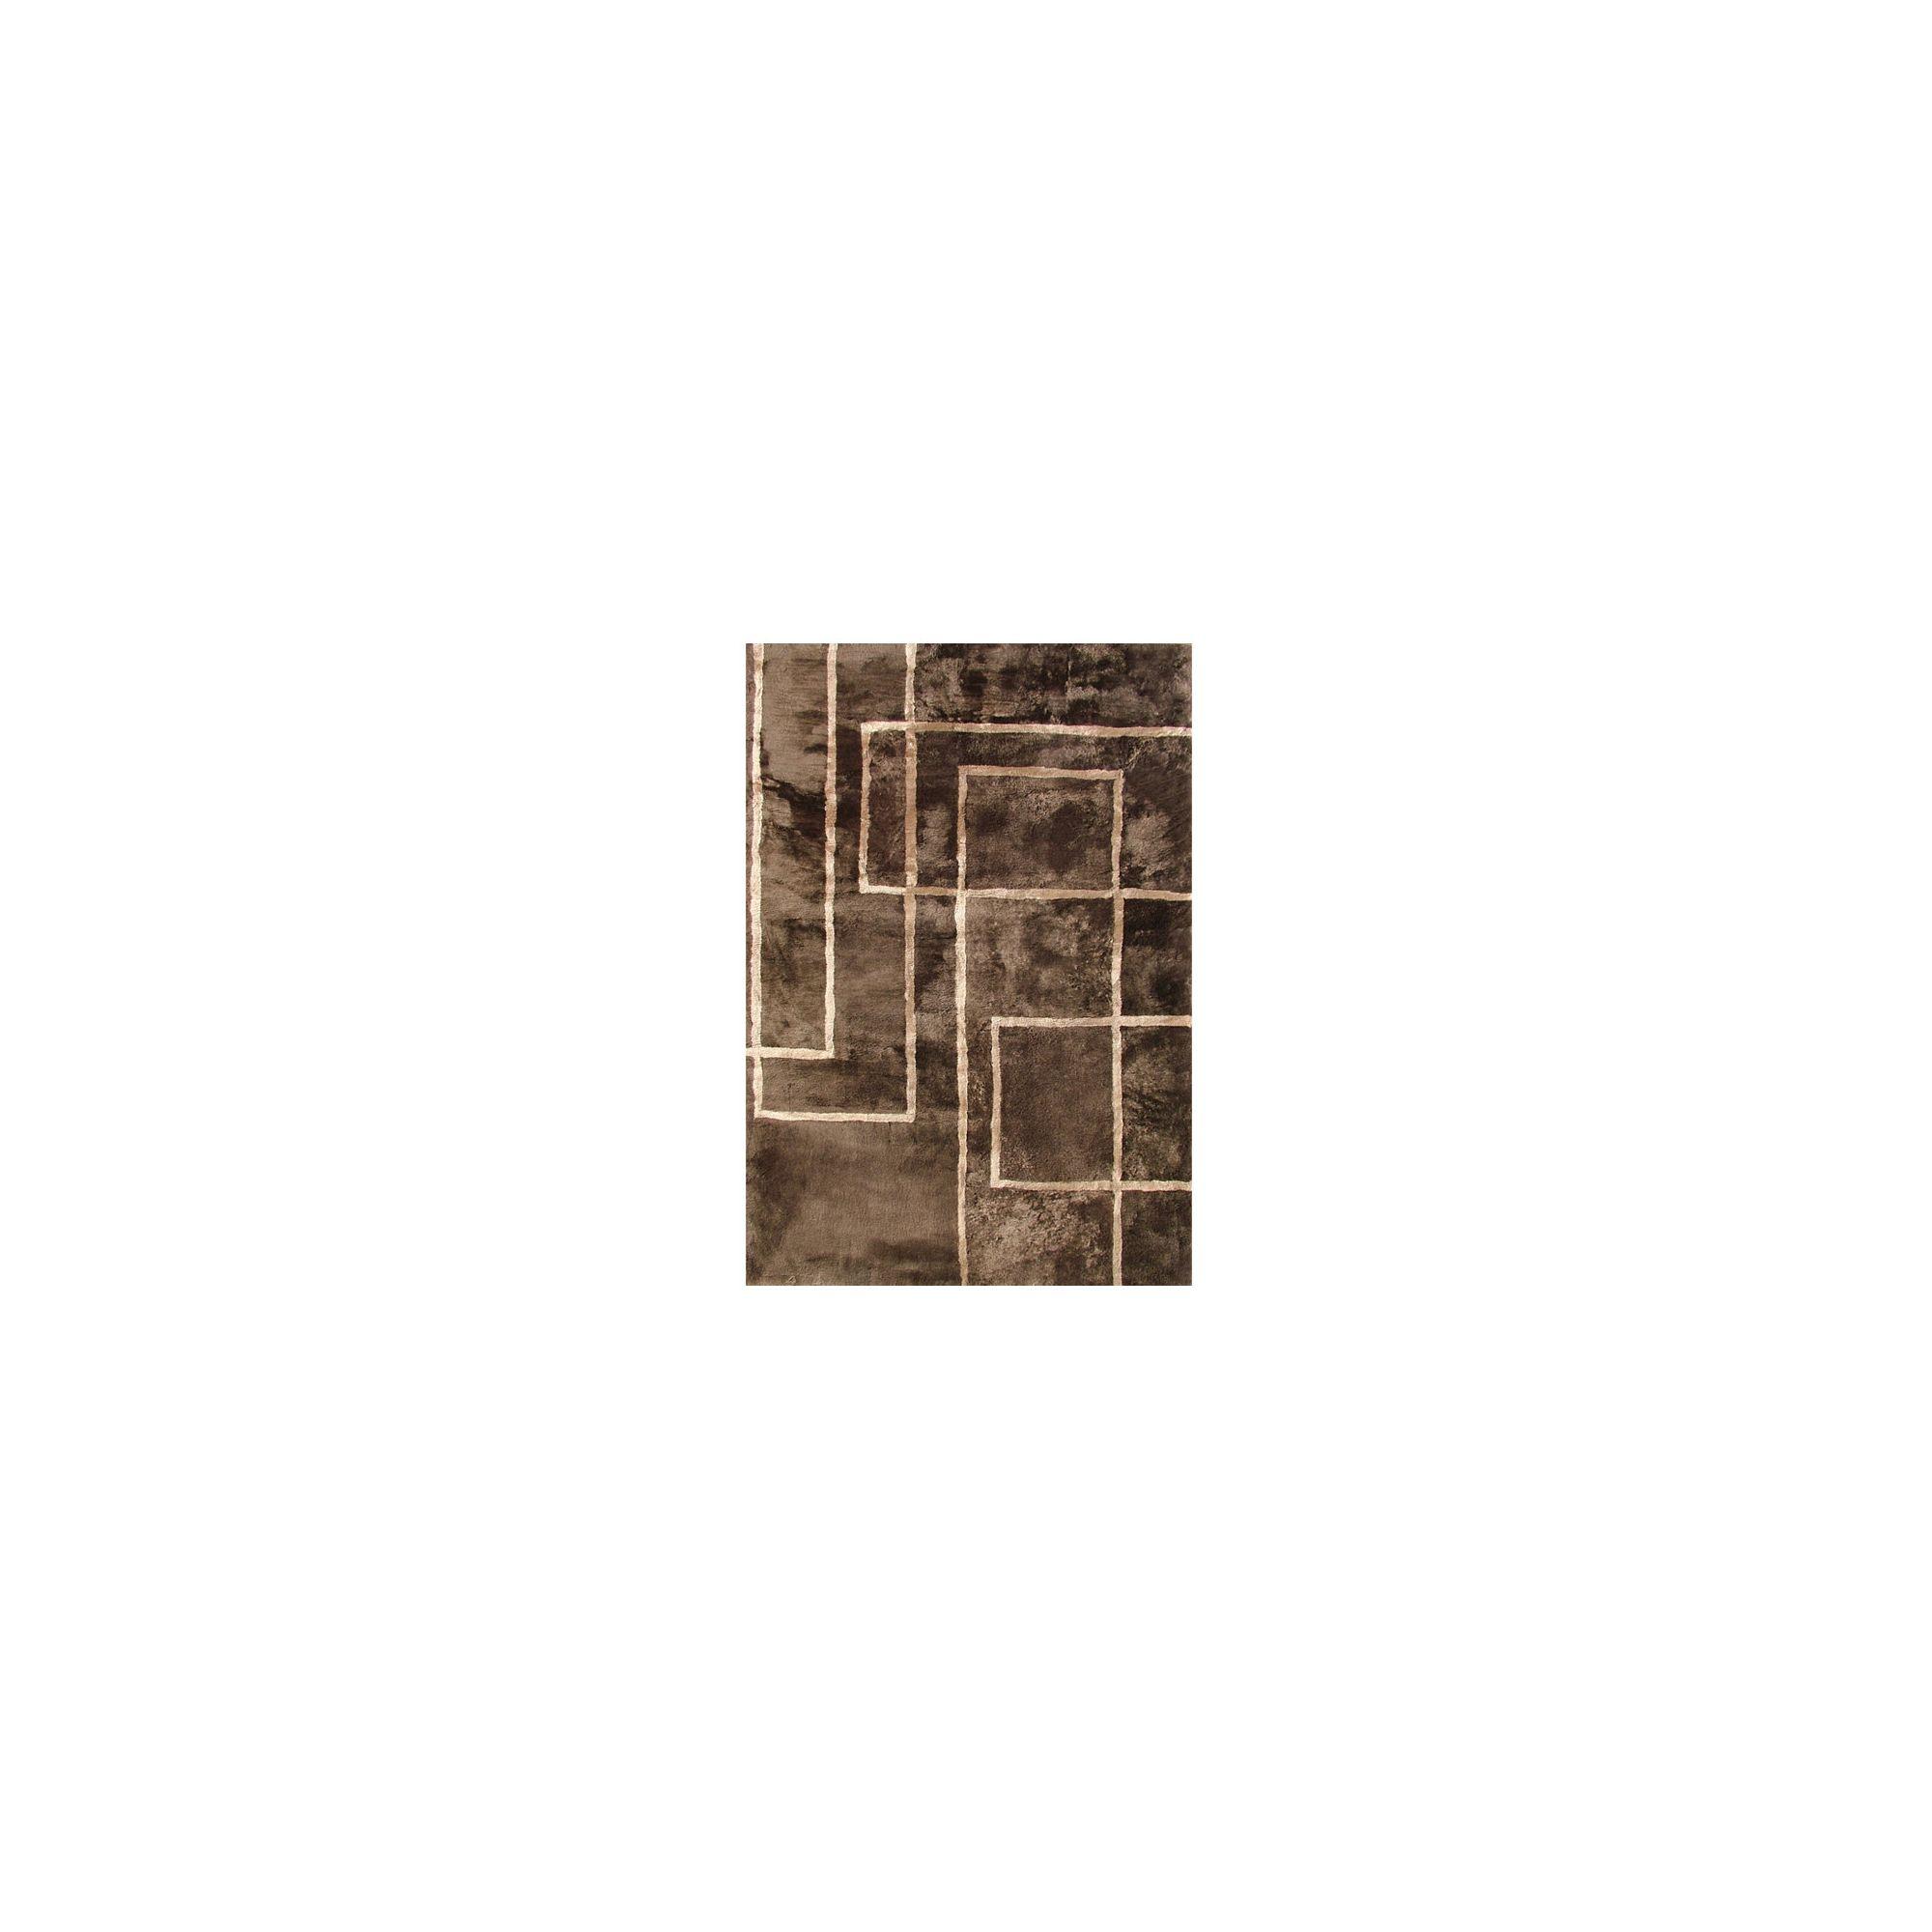 Bowron Sheepskin Shortwool Design Corners Rug - 350cm H x 250cm W x 1cm D at Tesco Direct